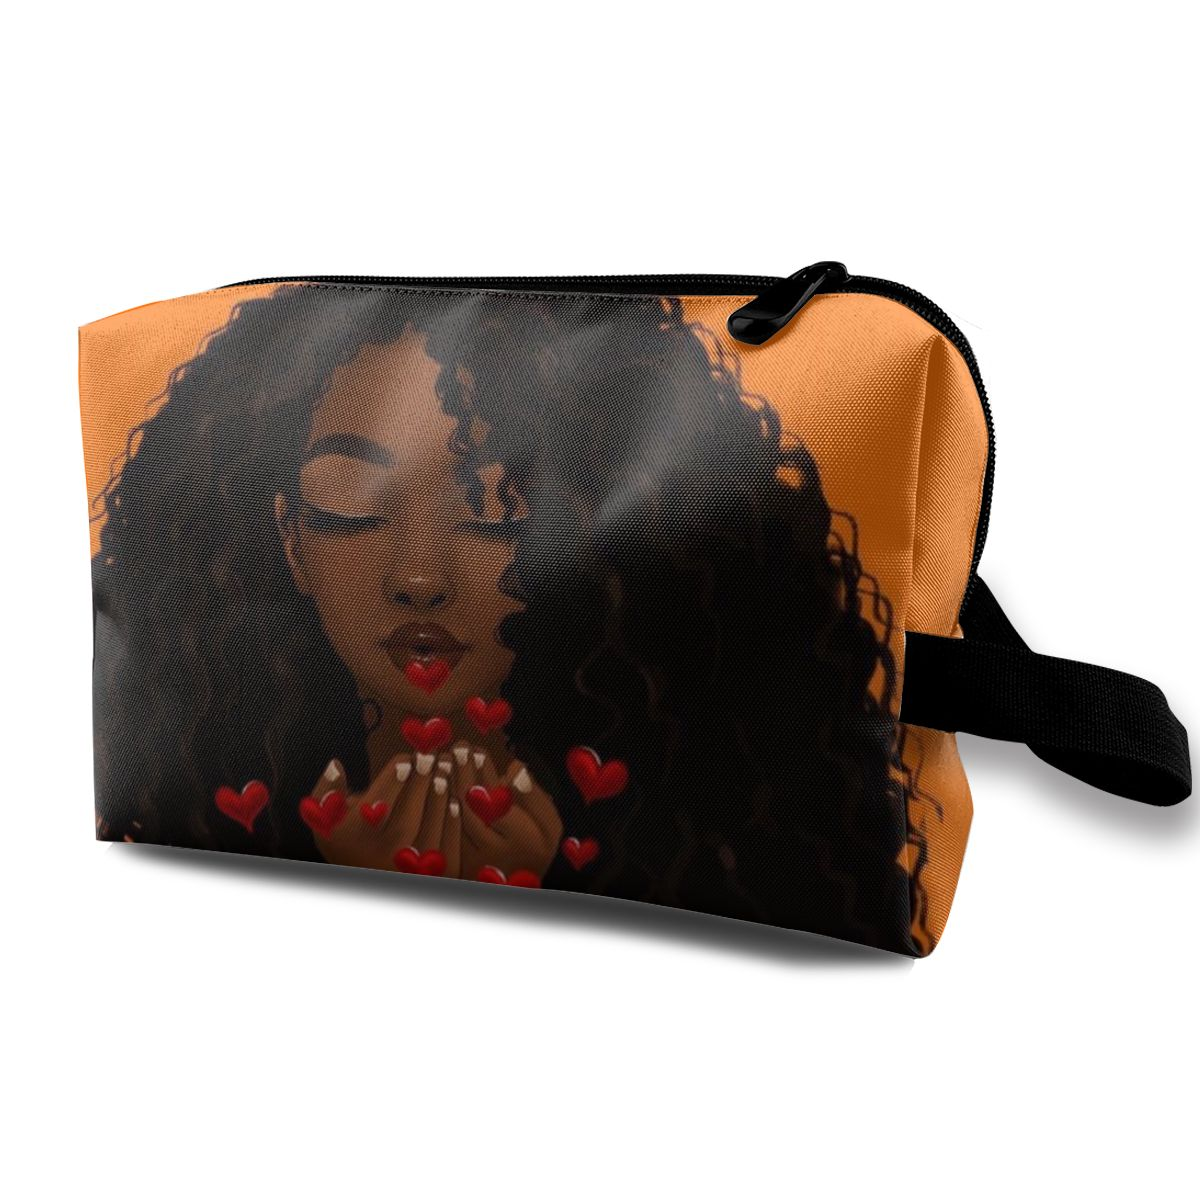 NOISYDESIGNS, bolsa de cosméticos negra con estampado africano para chicas, bolsas cosméticas bonitas para viajar, bolsa de maquillaje para mujeres, estuche de lápices